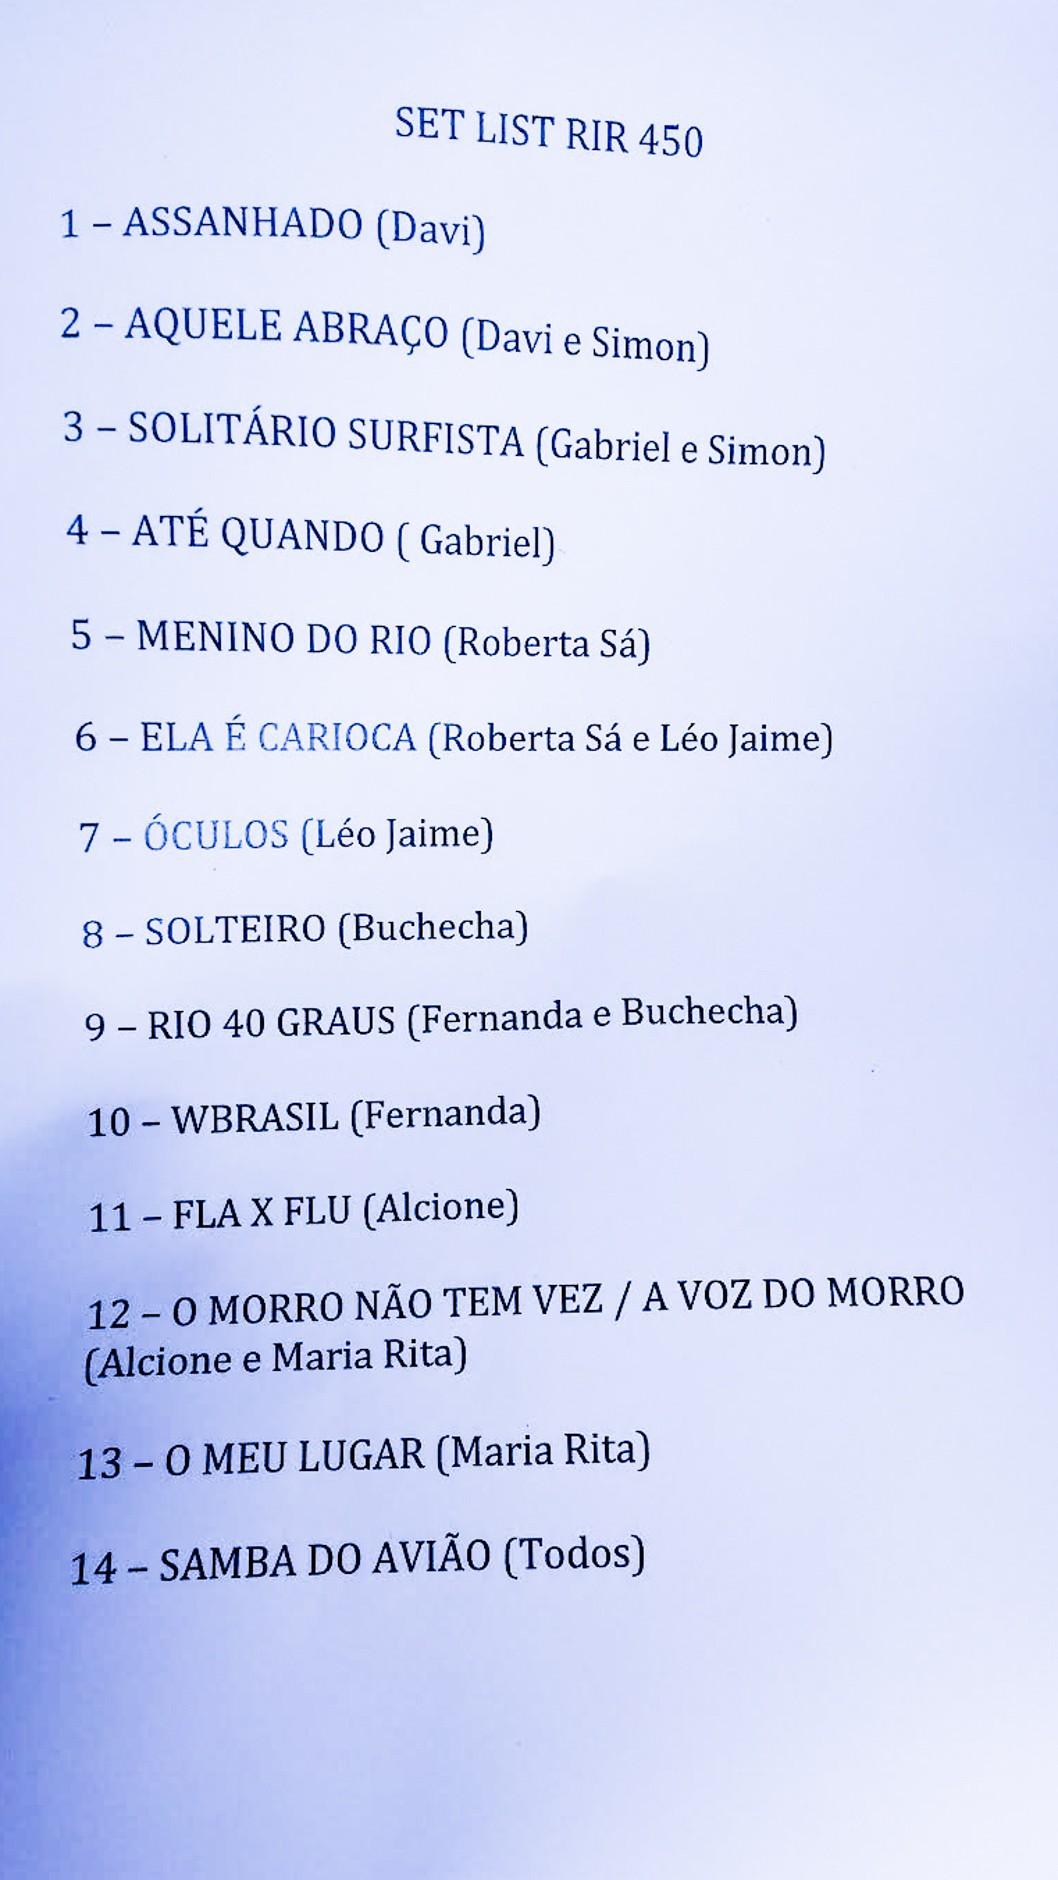 Setlist 450 Rock in Rio 2015 (Foto: Multishow)